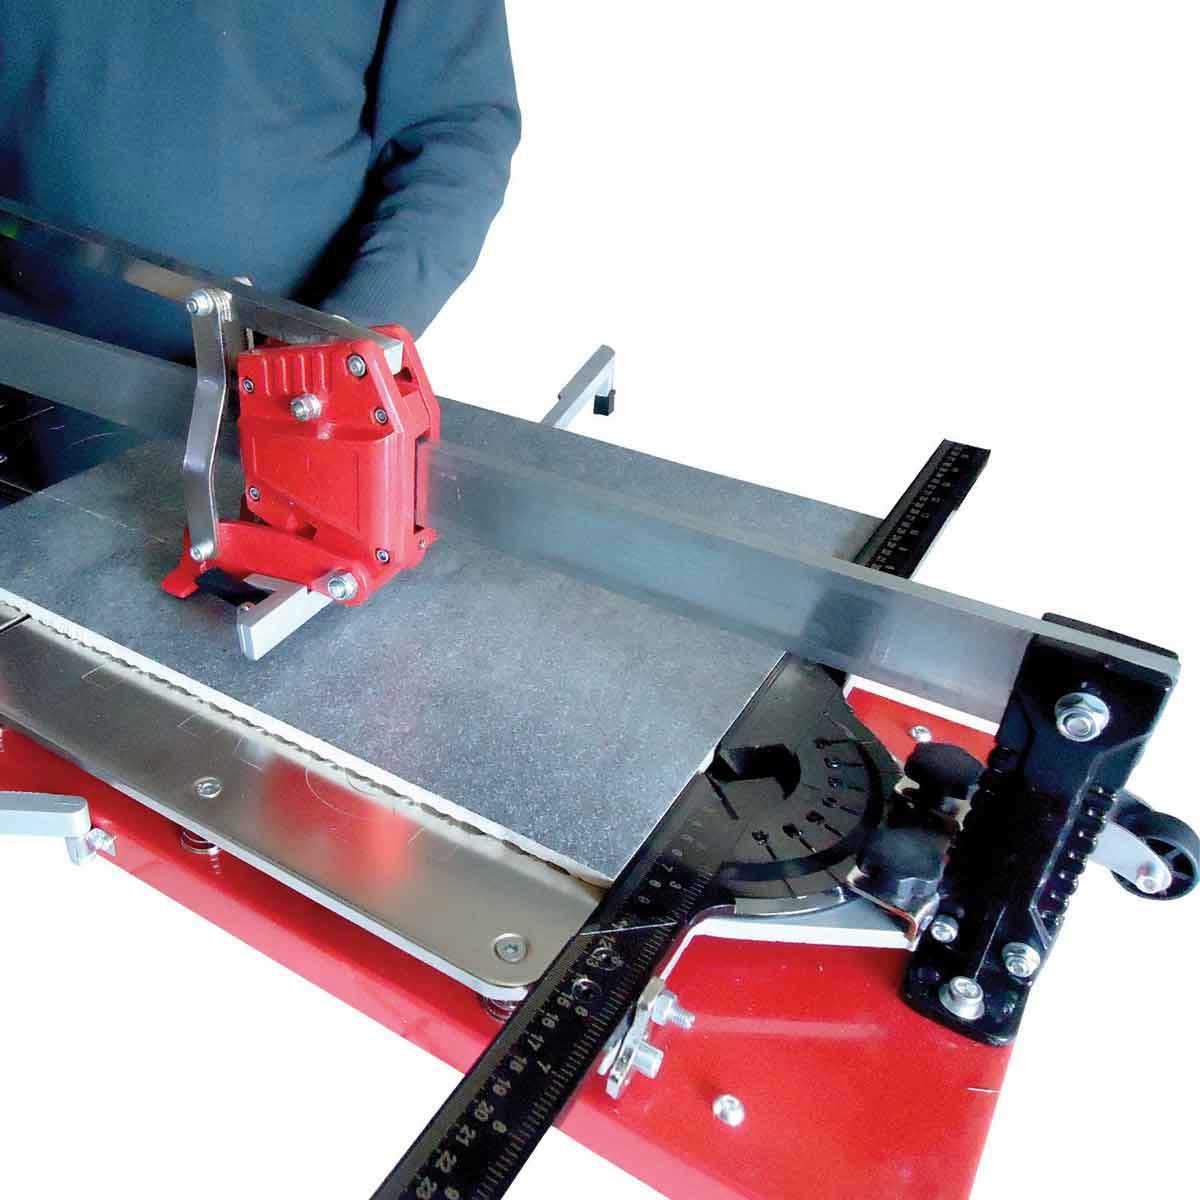 Tomecanic UltraPro cutter guide